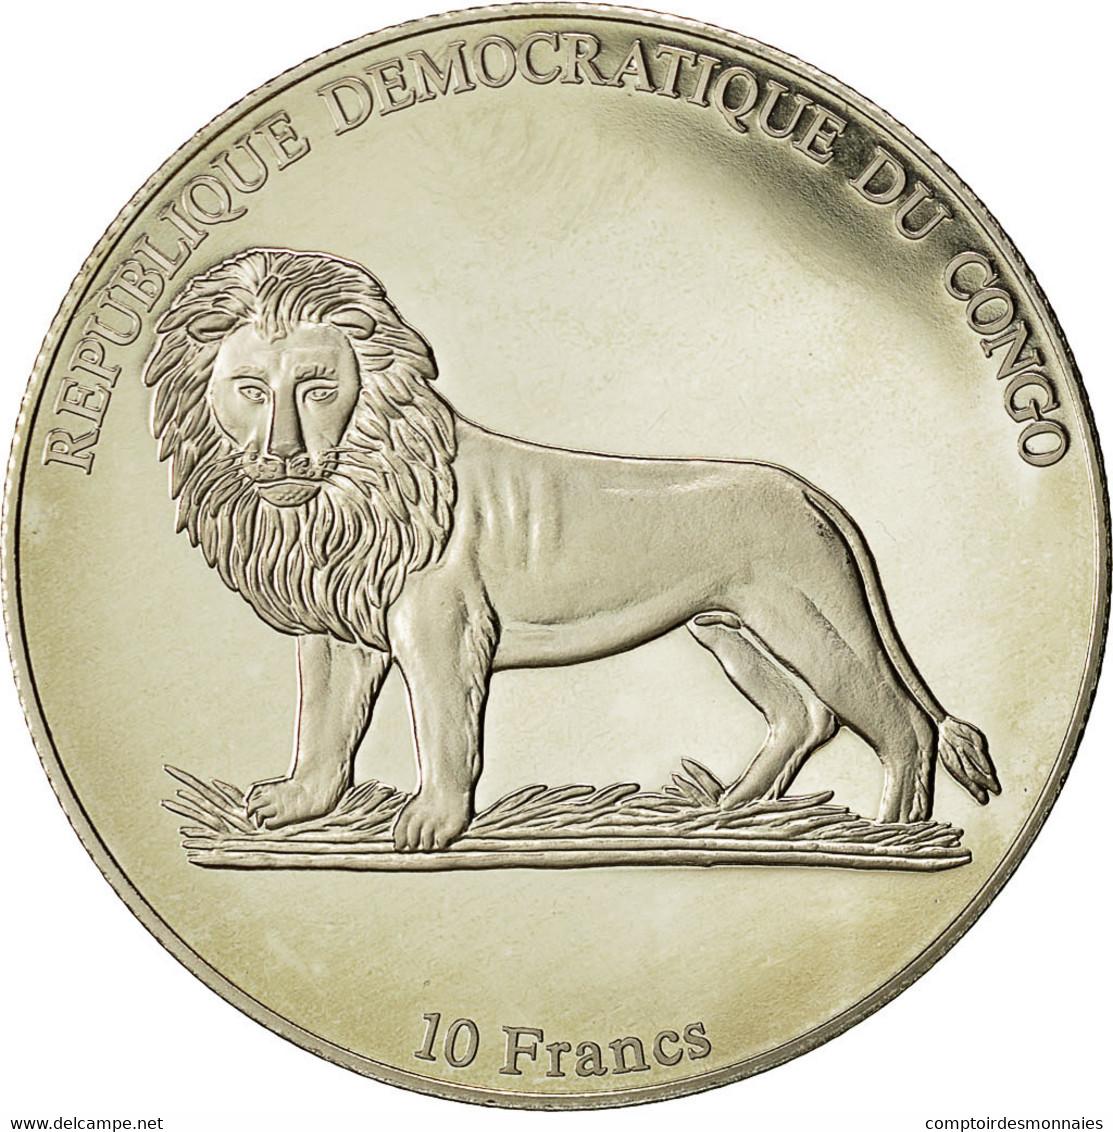 Monnaie, CONGO, DEMOCRATIC REPUBLIC, 10 Francs, 2002, FDC, Copper-nickel, KM:191 - Congo (Repubblica Democratica 1998)